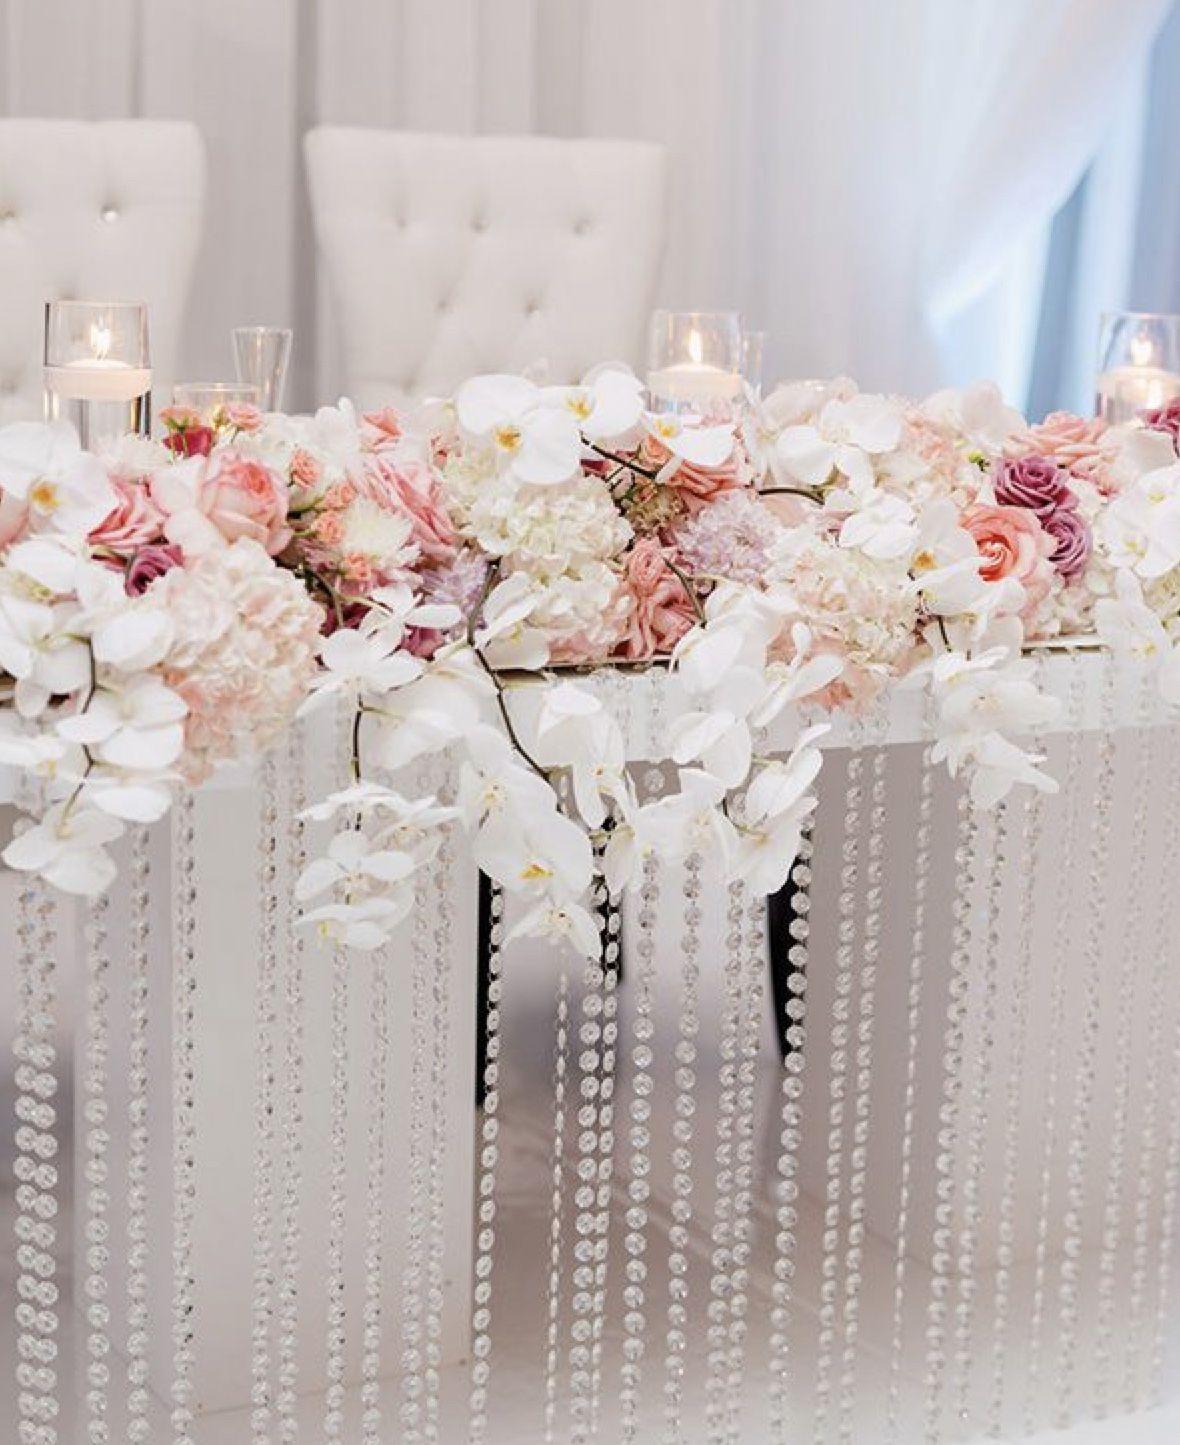 Wedding Reception Head Table Ideas: Wedding Reception Decorations